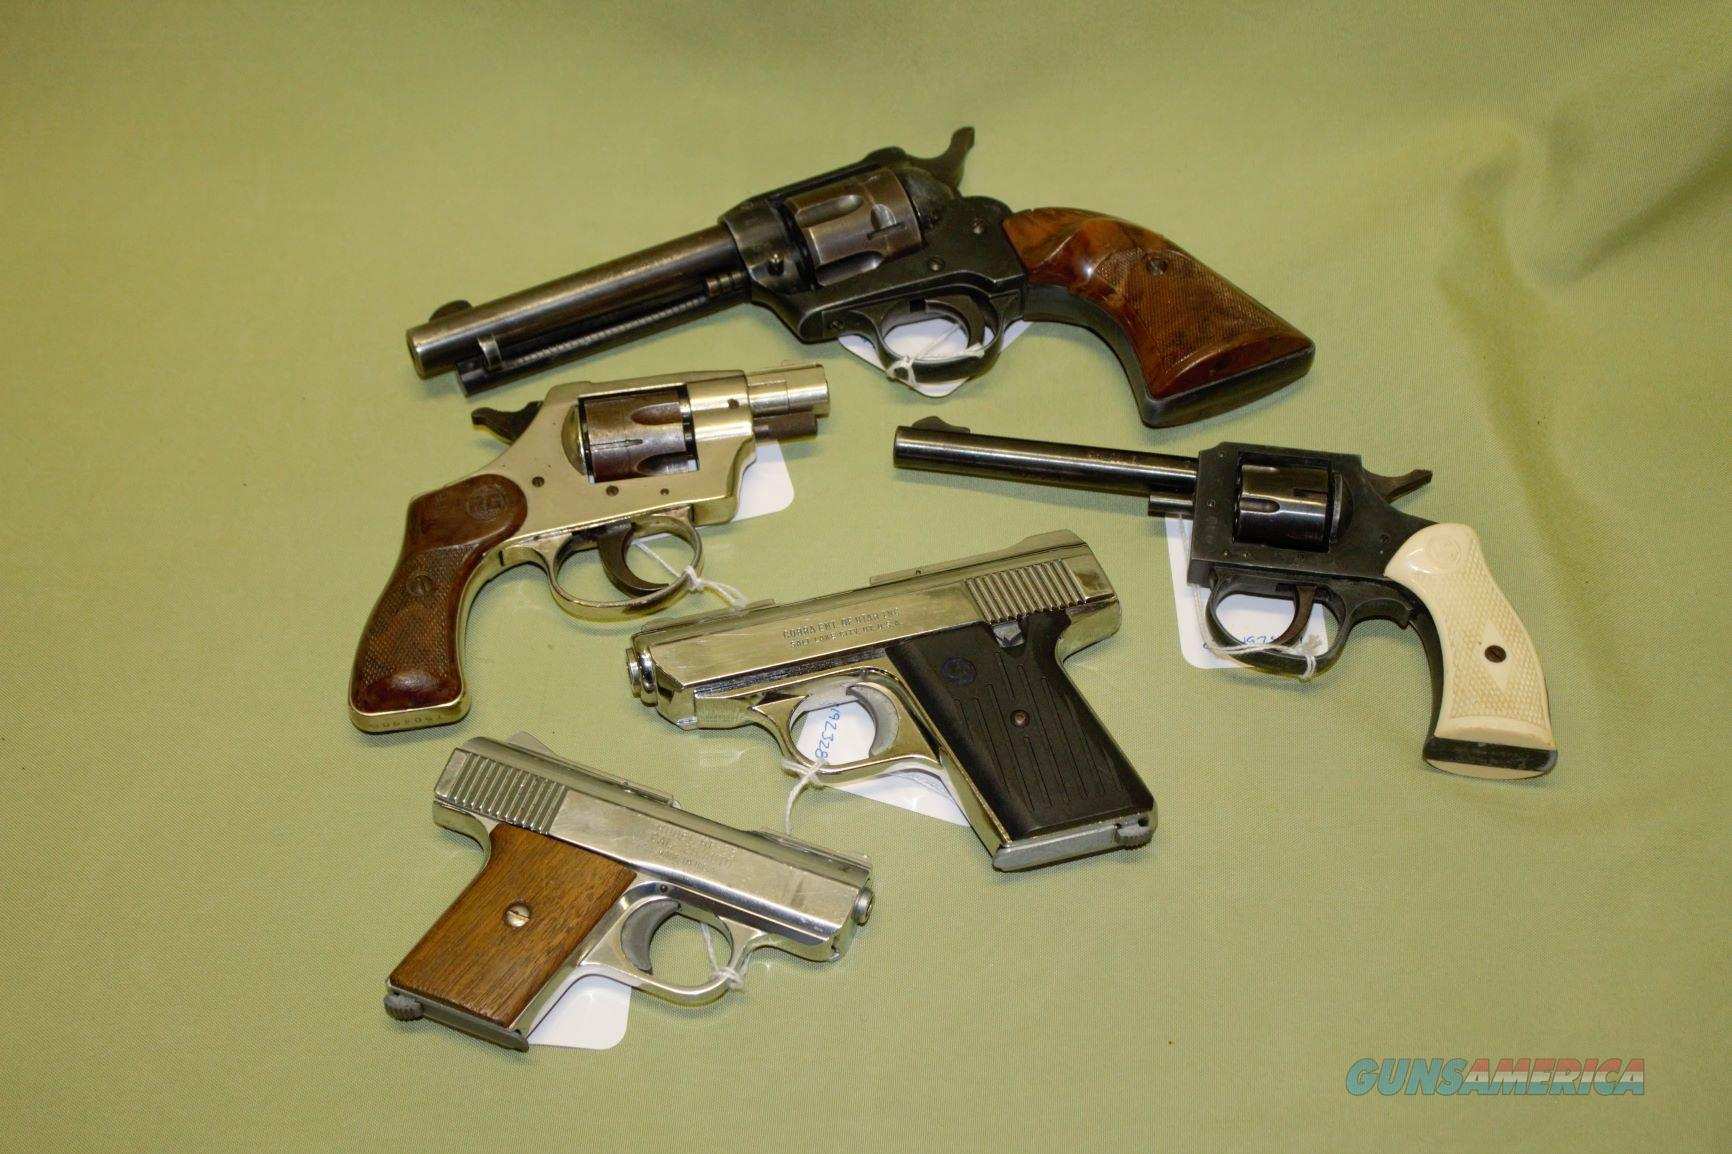 Cobra, Raven Arms, HS, RG pistols  Guns > Pistols > R Misc Pistols